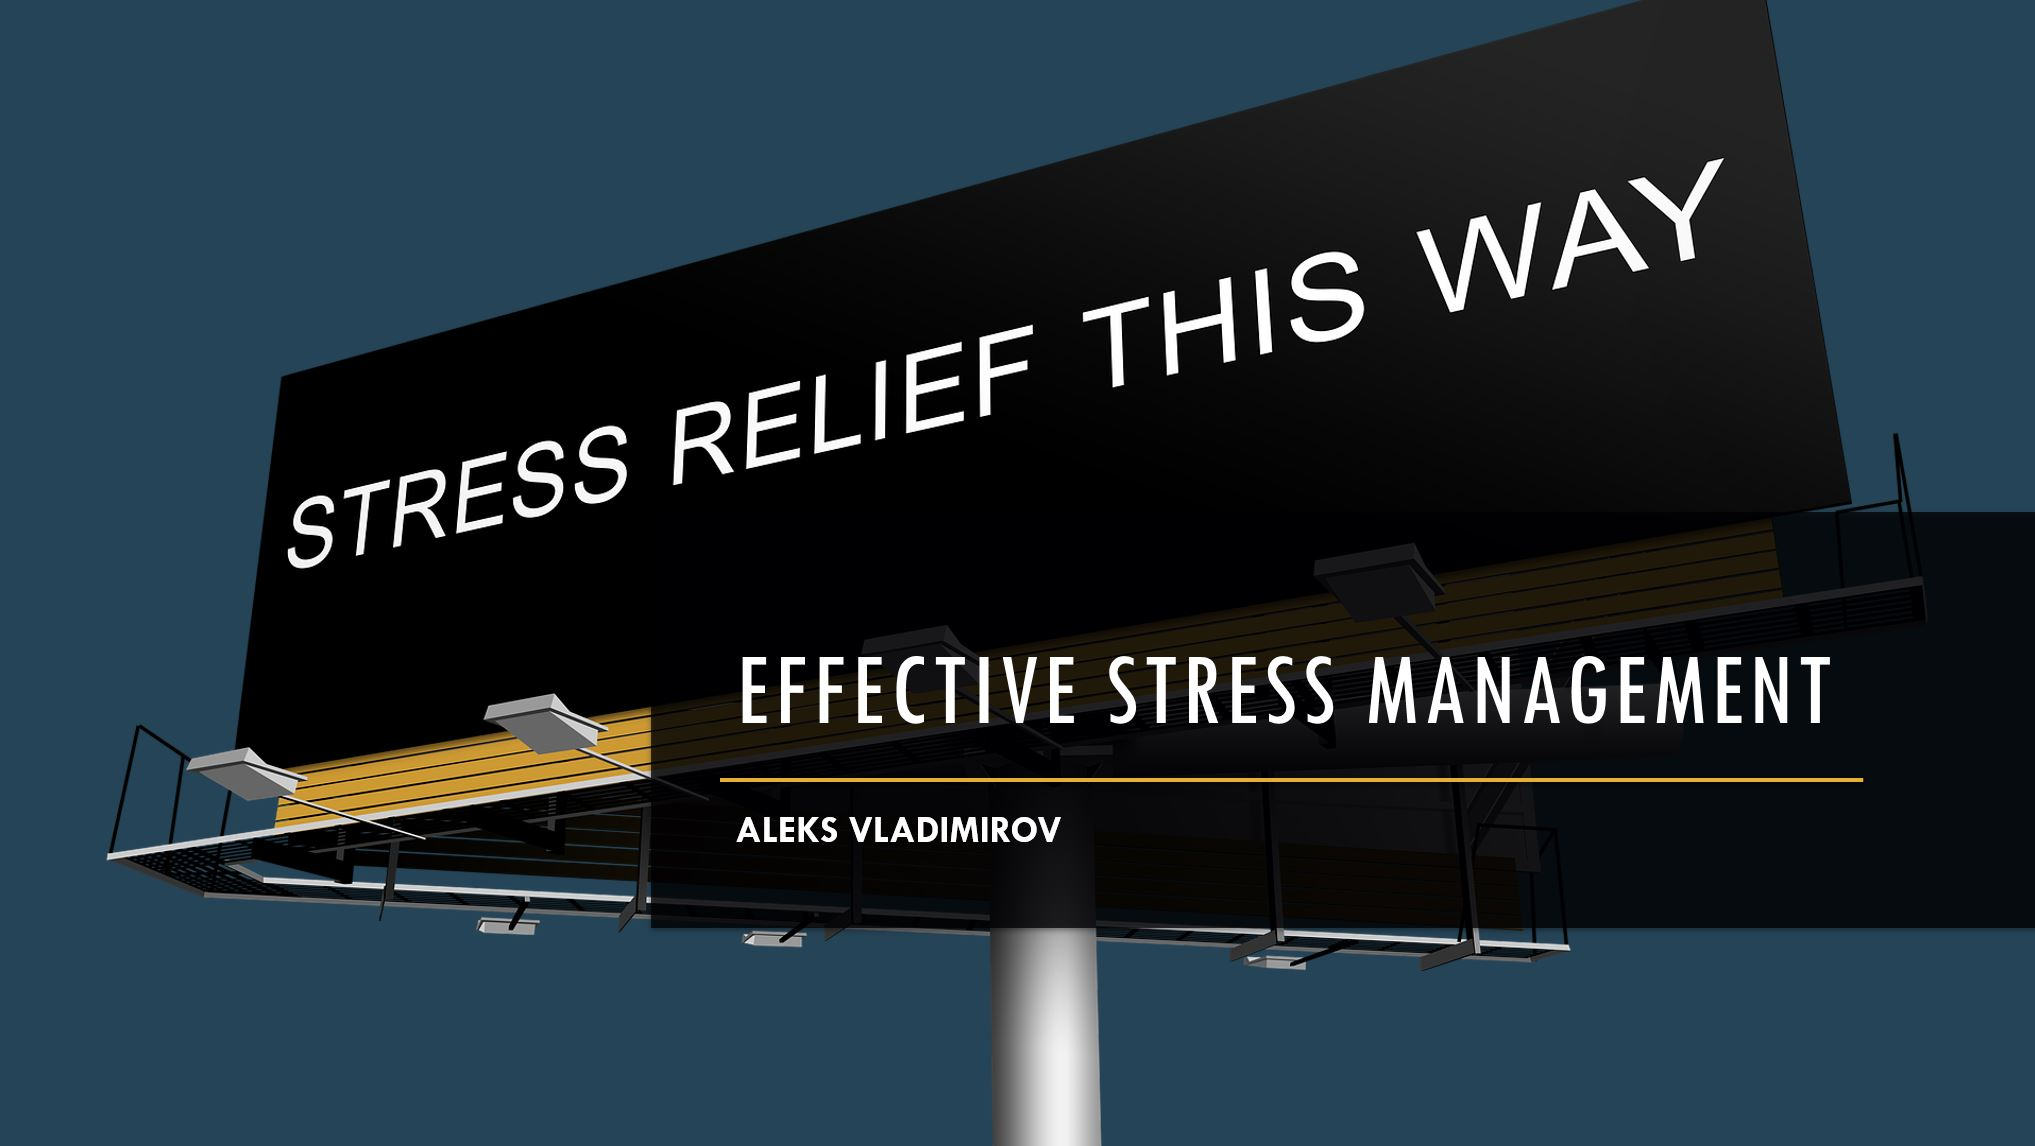 Effective Stress Management Training